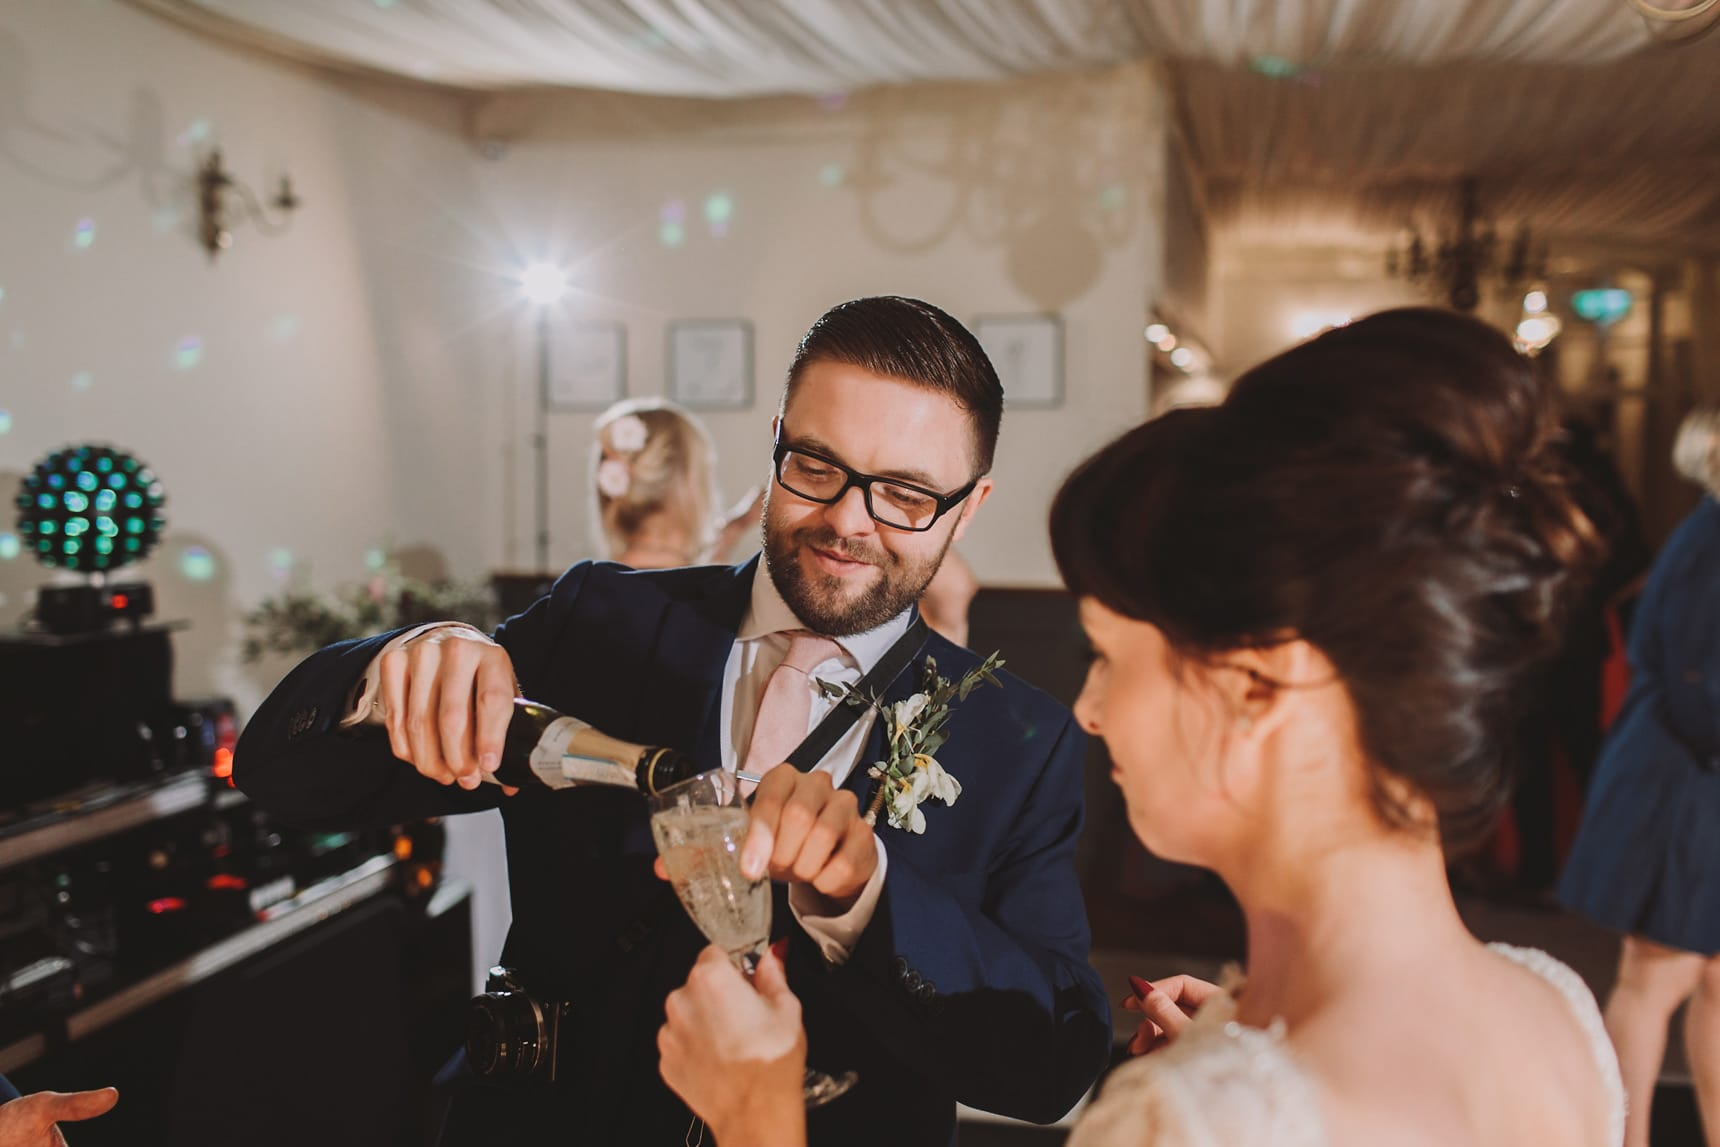 evening wedding photographer